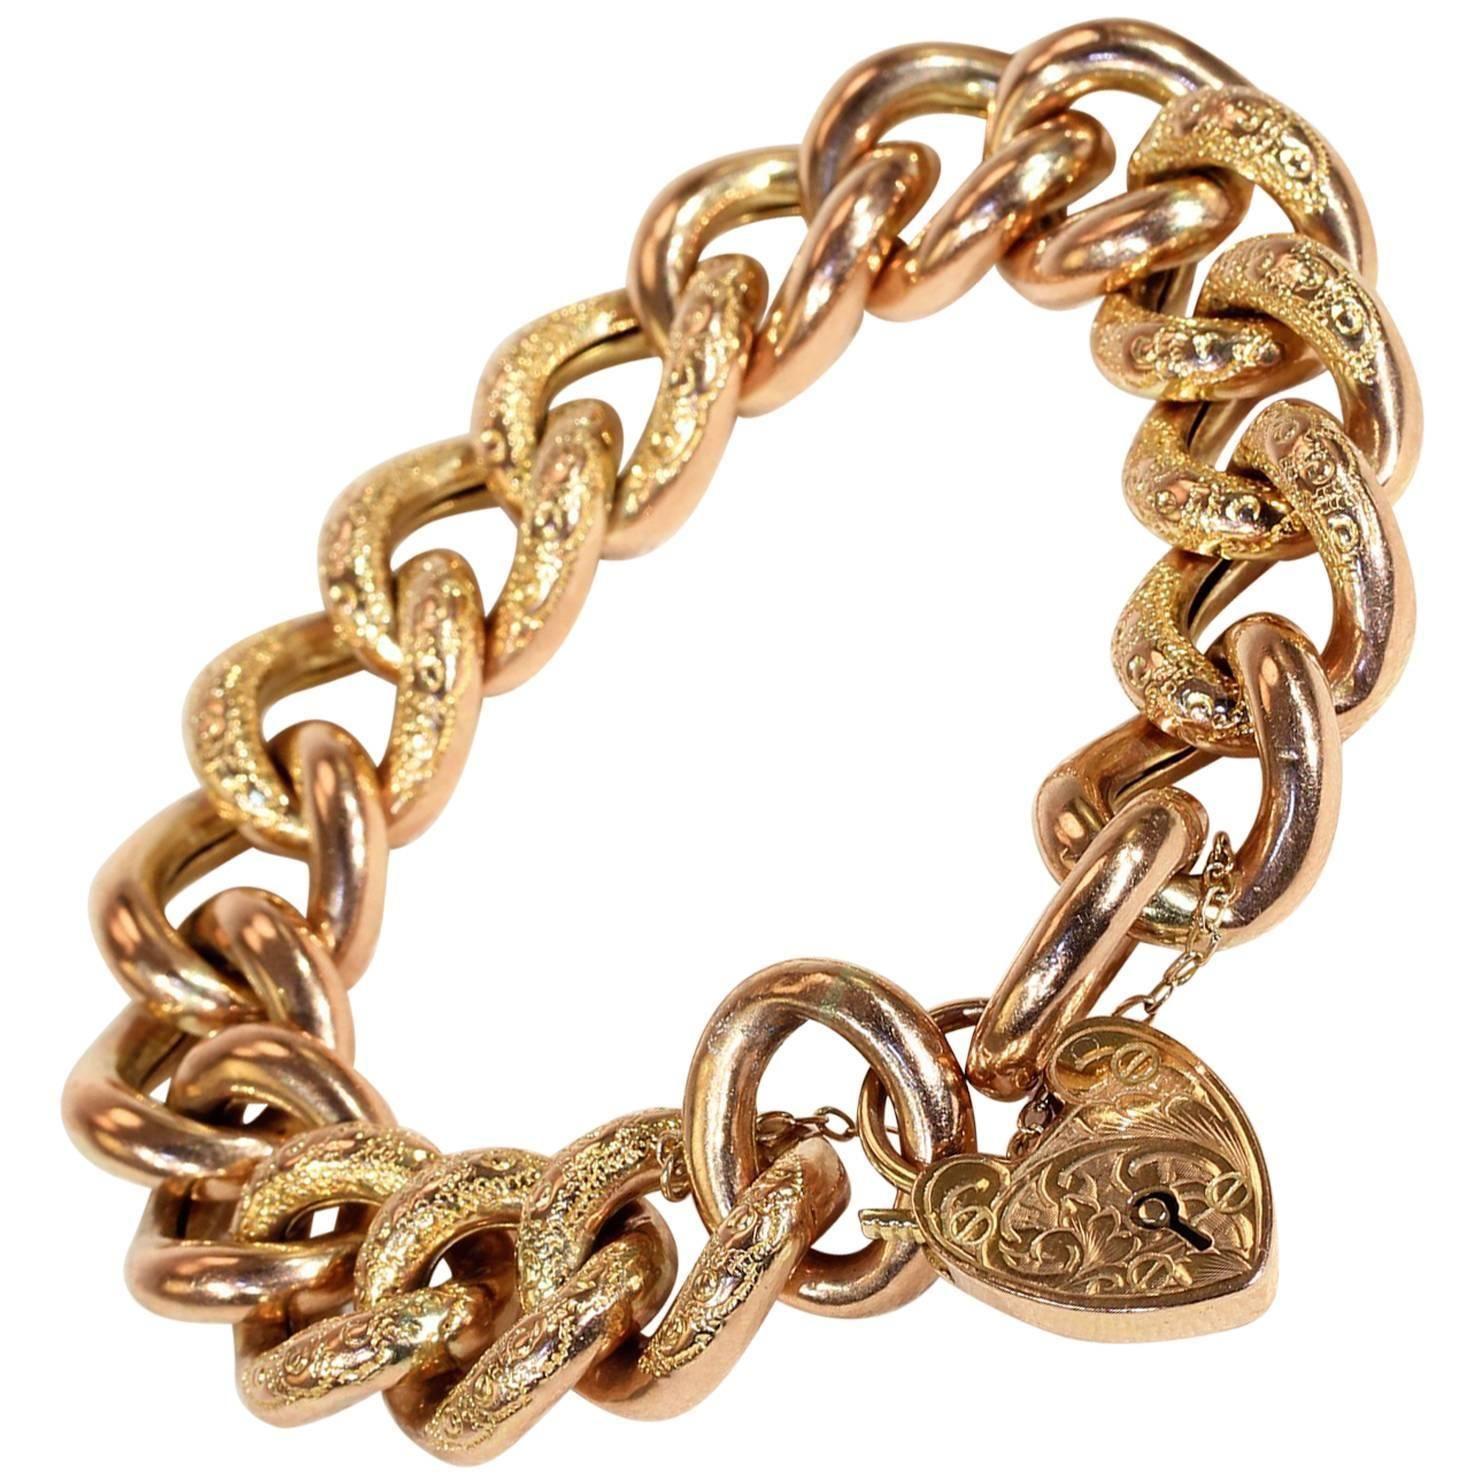 Antique Victorian Gold Curb Link Heart Lock Bracelet